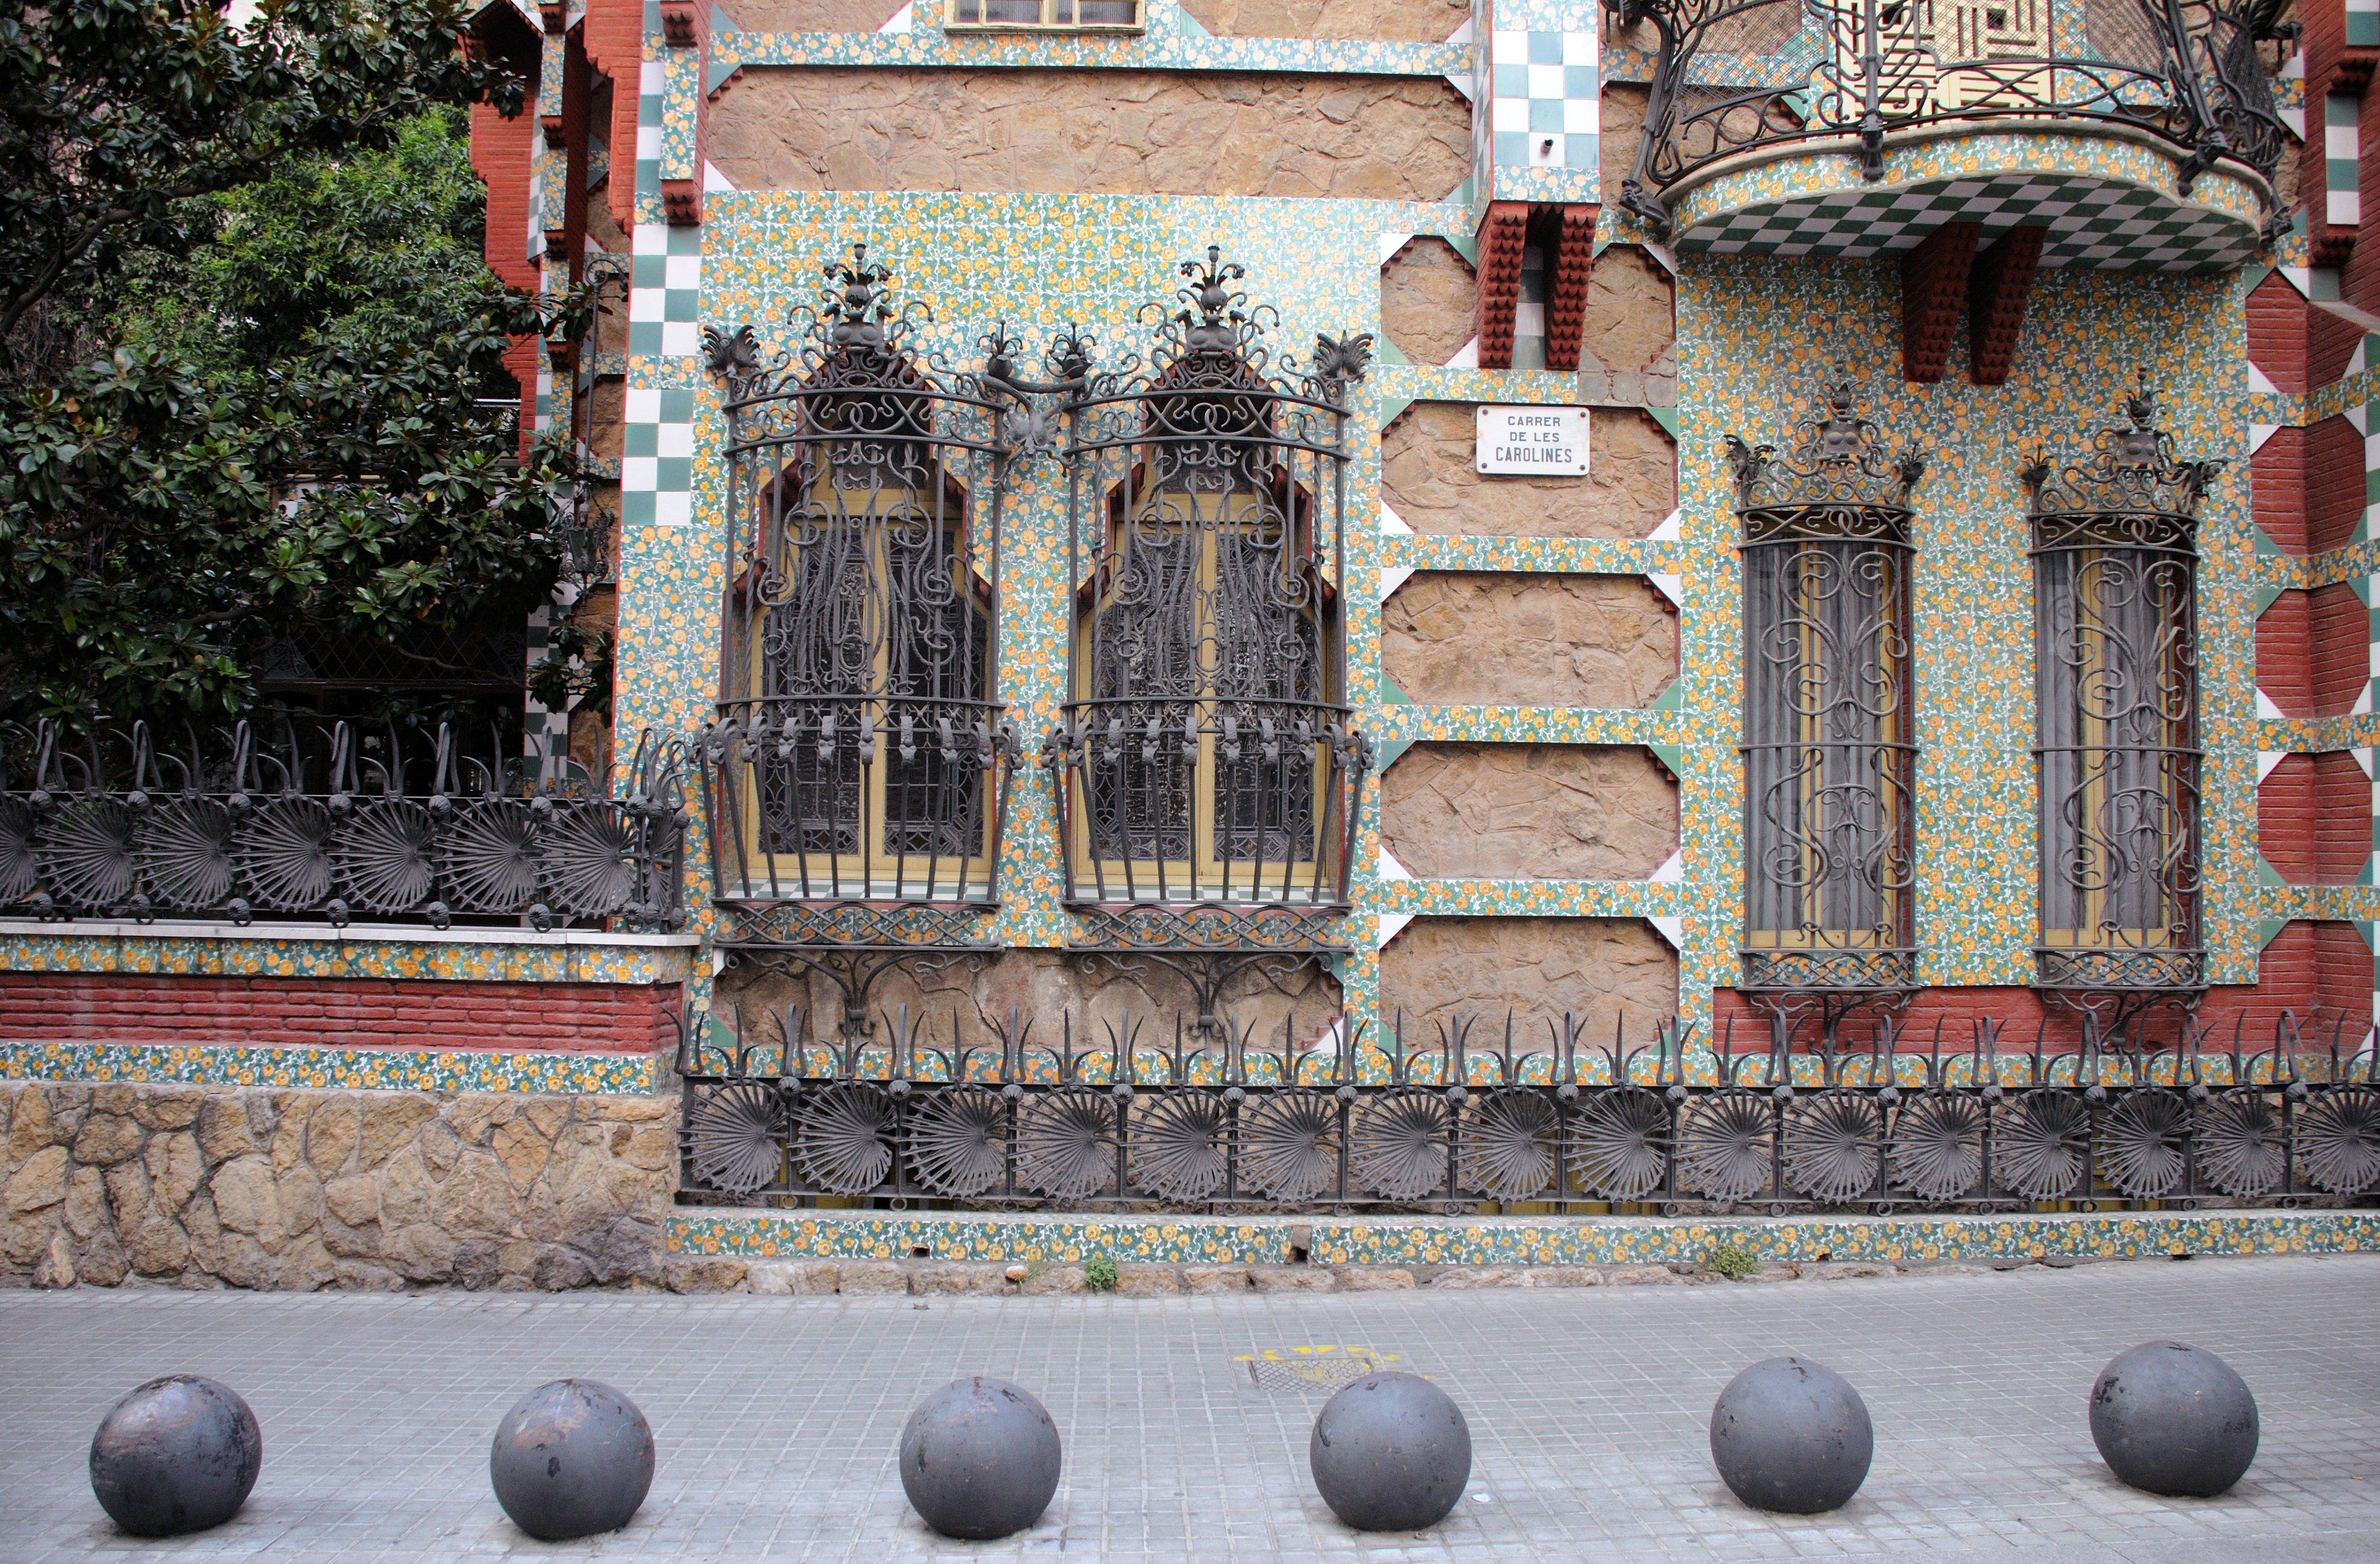 Casa Vicens by Antoni Gaudí in Barcelona, Spain